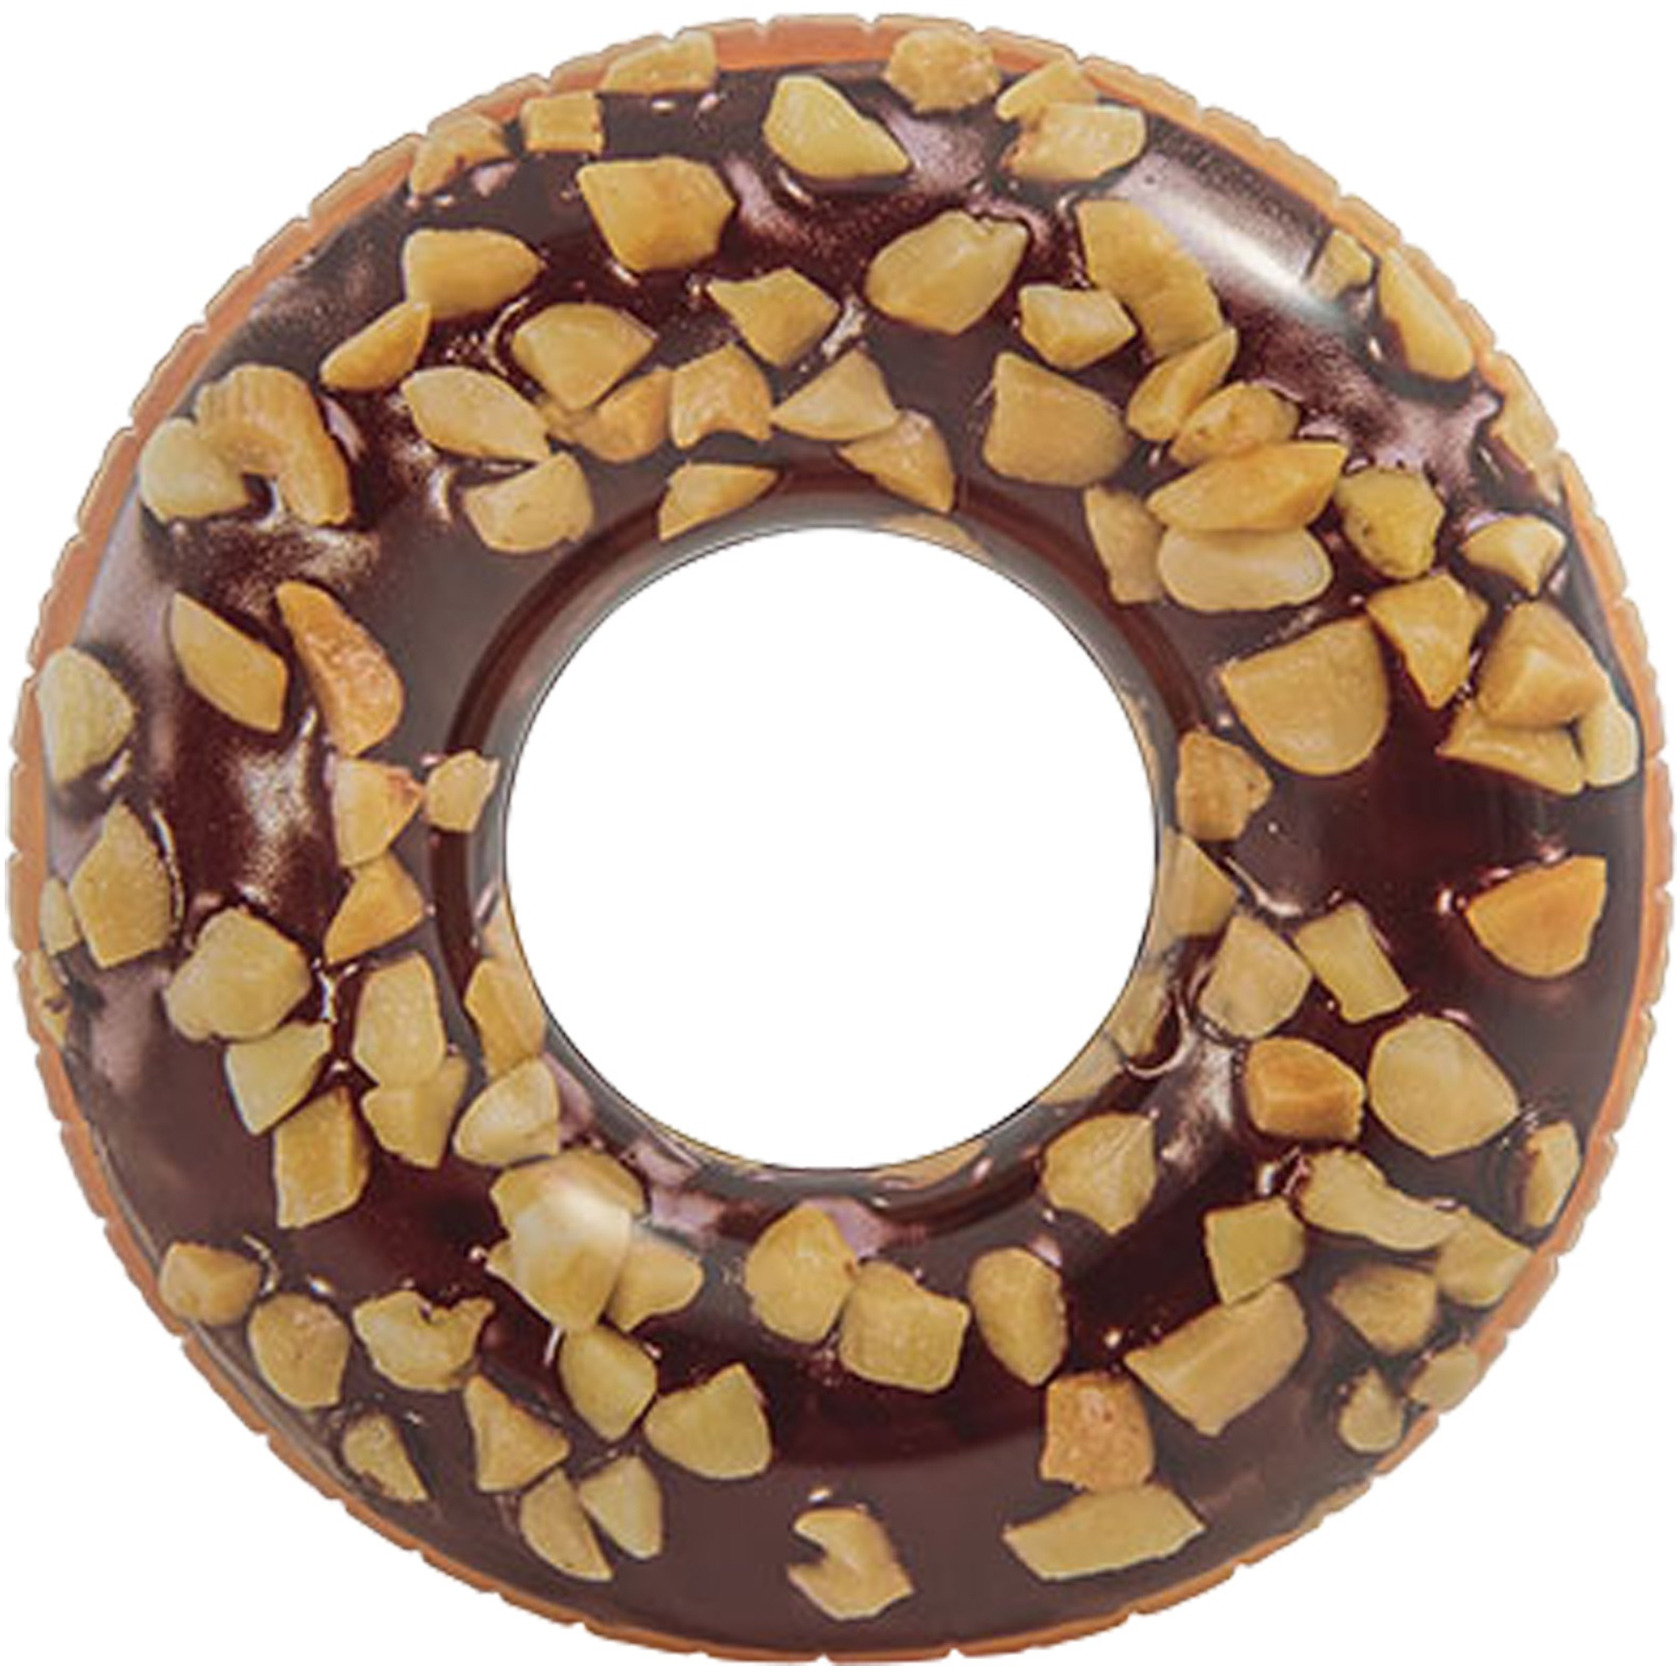 Chocolade donut opblaasbare zwemband 114 cm